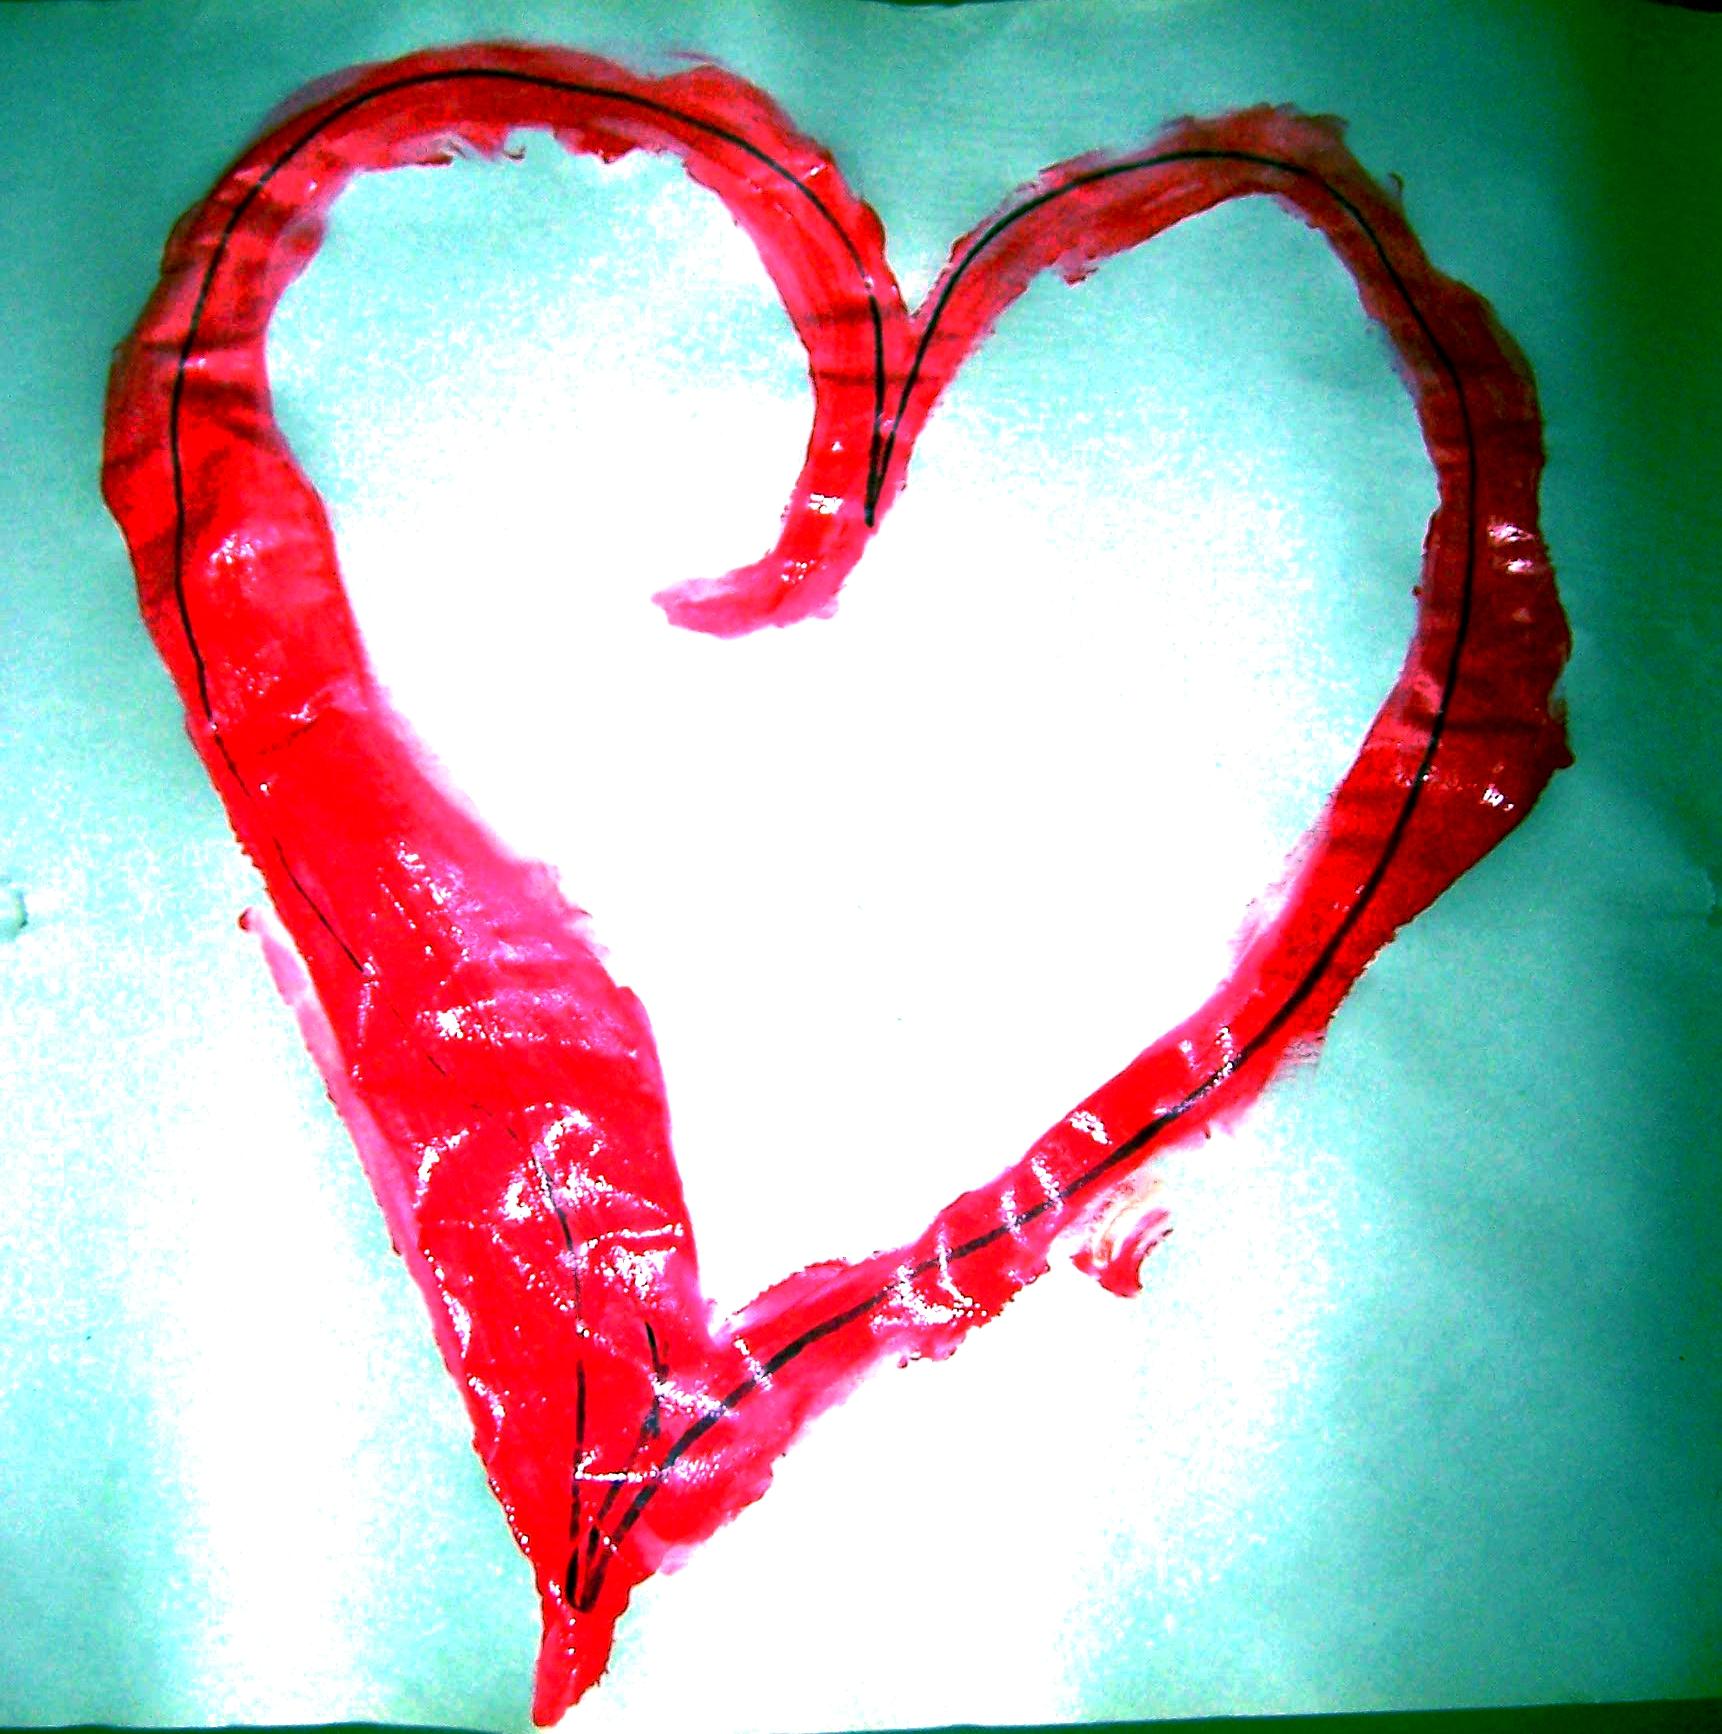 2. Love